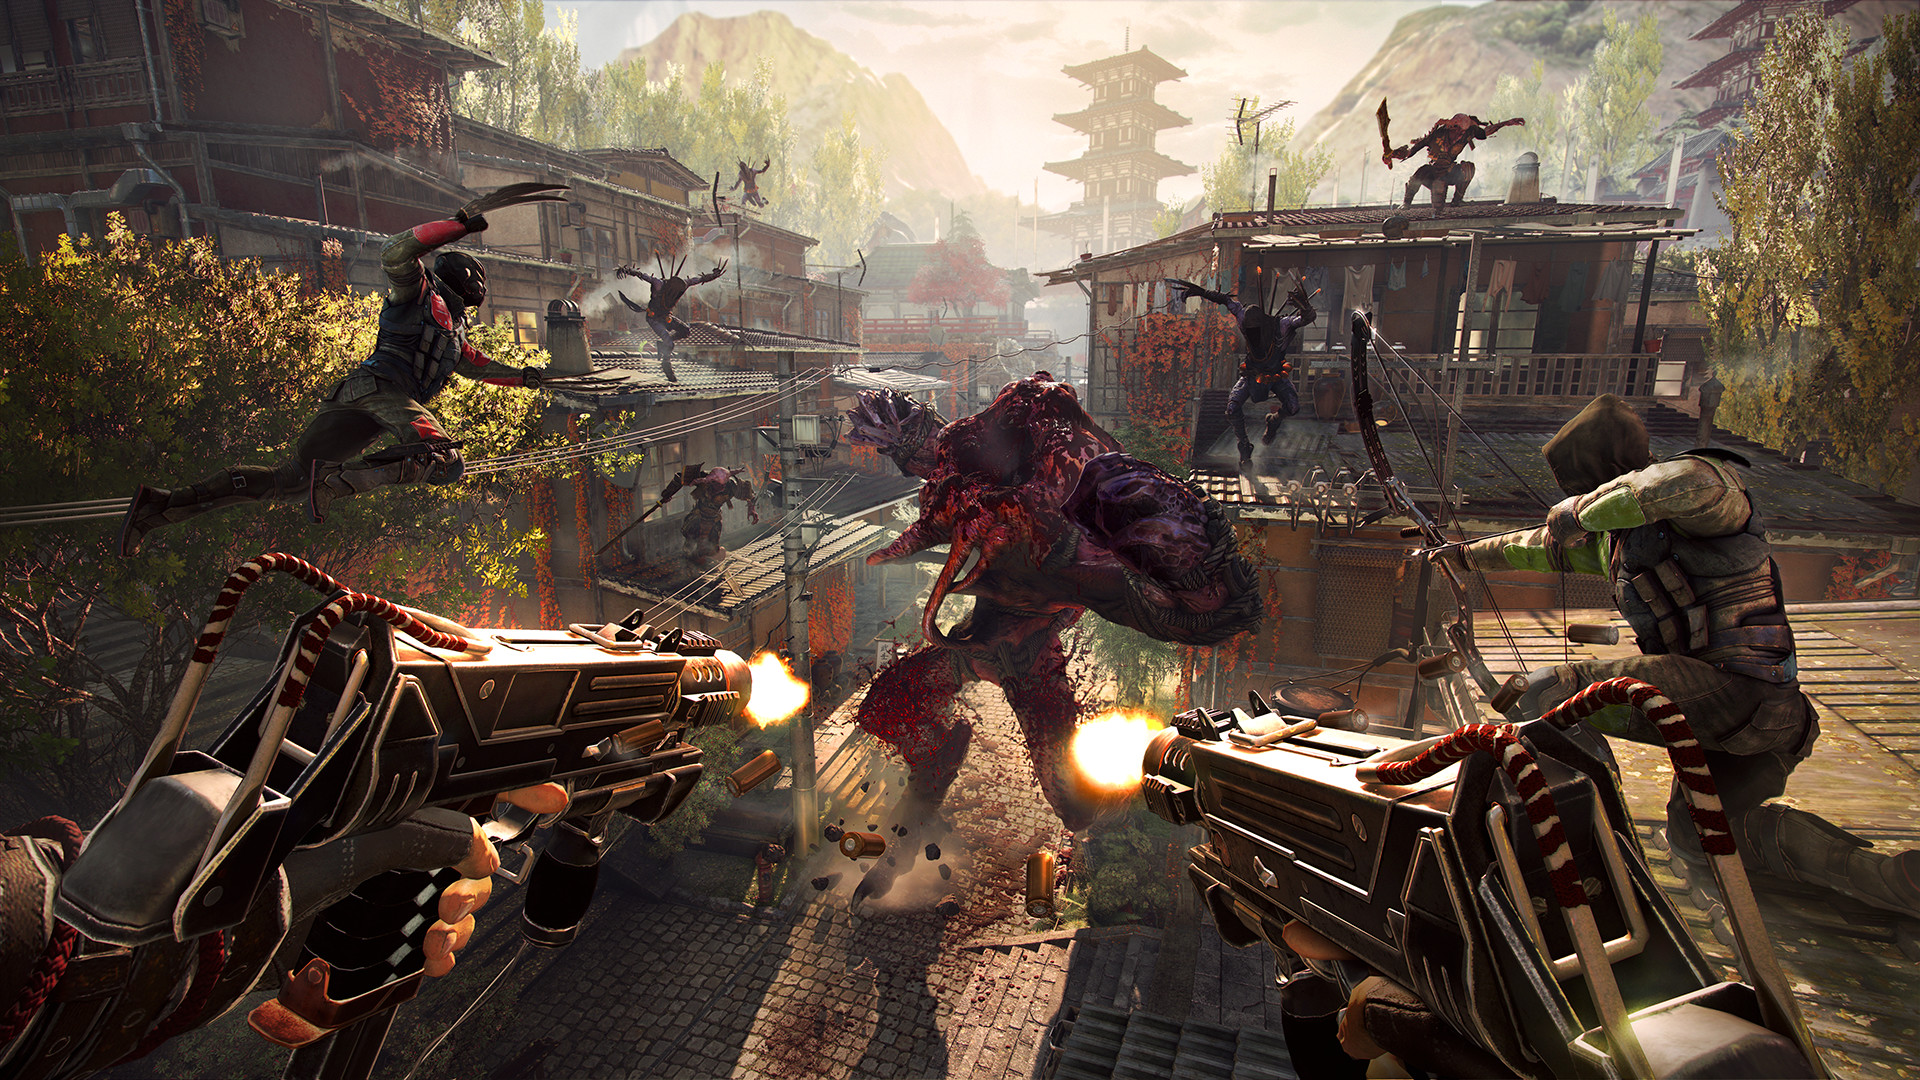 GOG бесплатно раздаёт игру Shadow Warrior 2 - ITC.ua